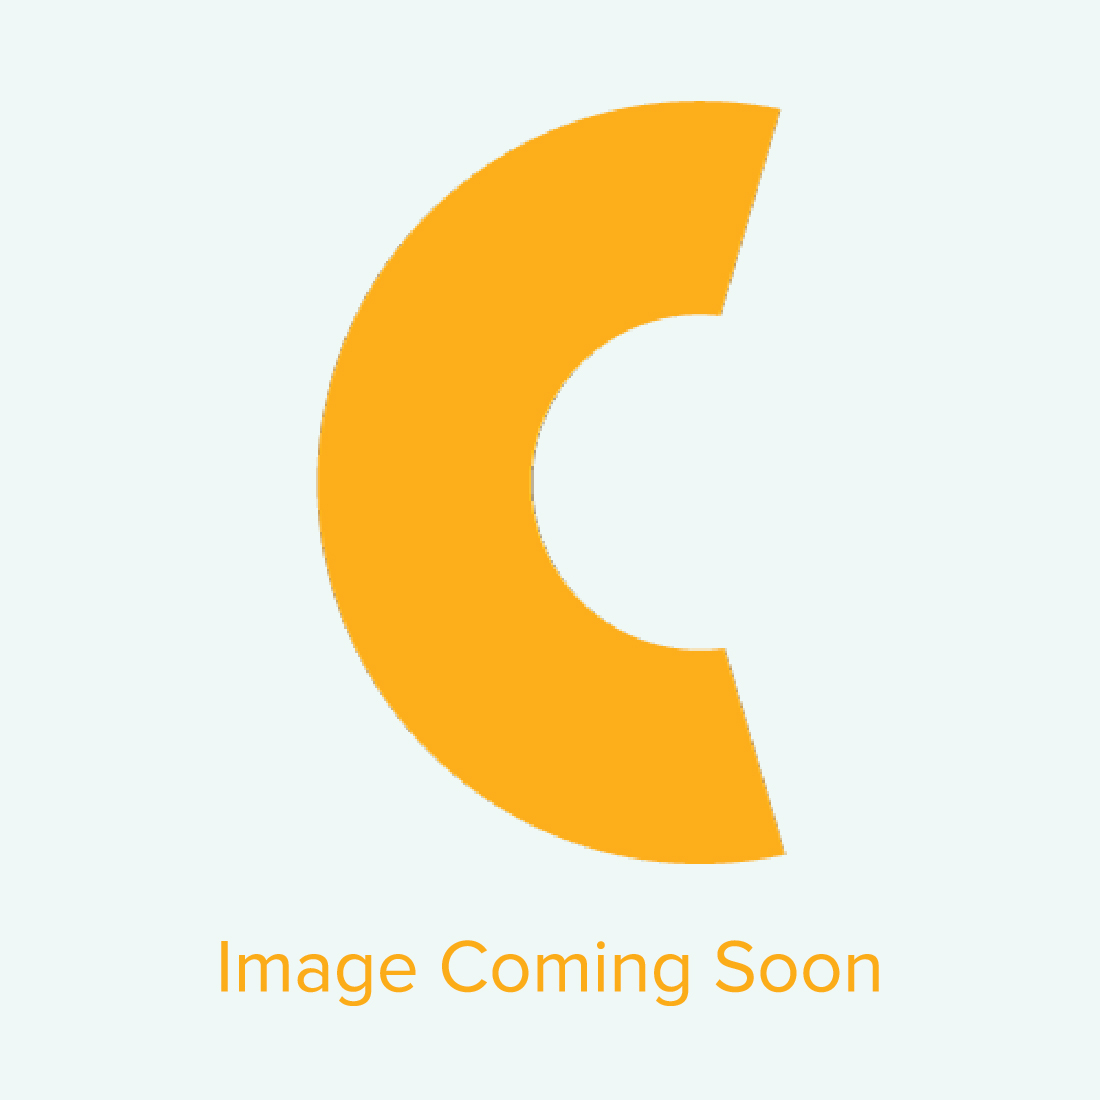 "Hotronix Craft 9"" x 12"" Clamshell Heat Press - OPEN BOX"